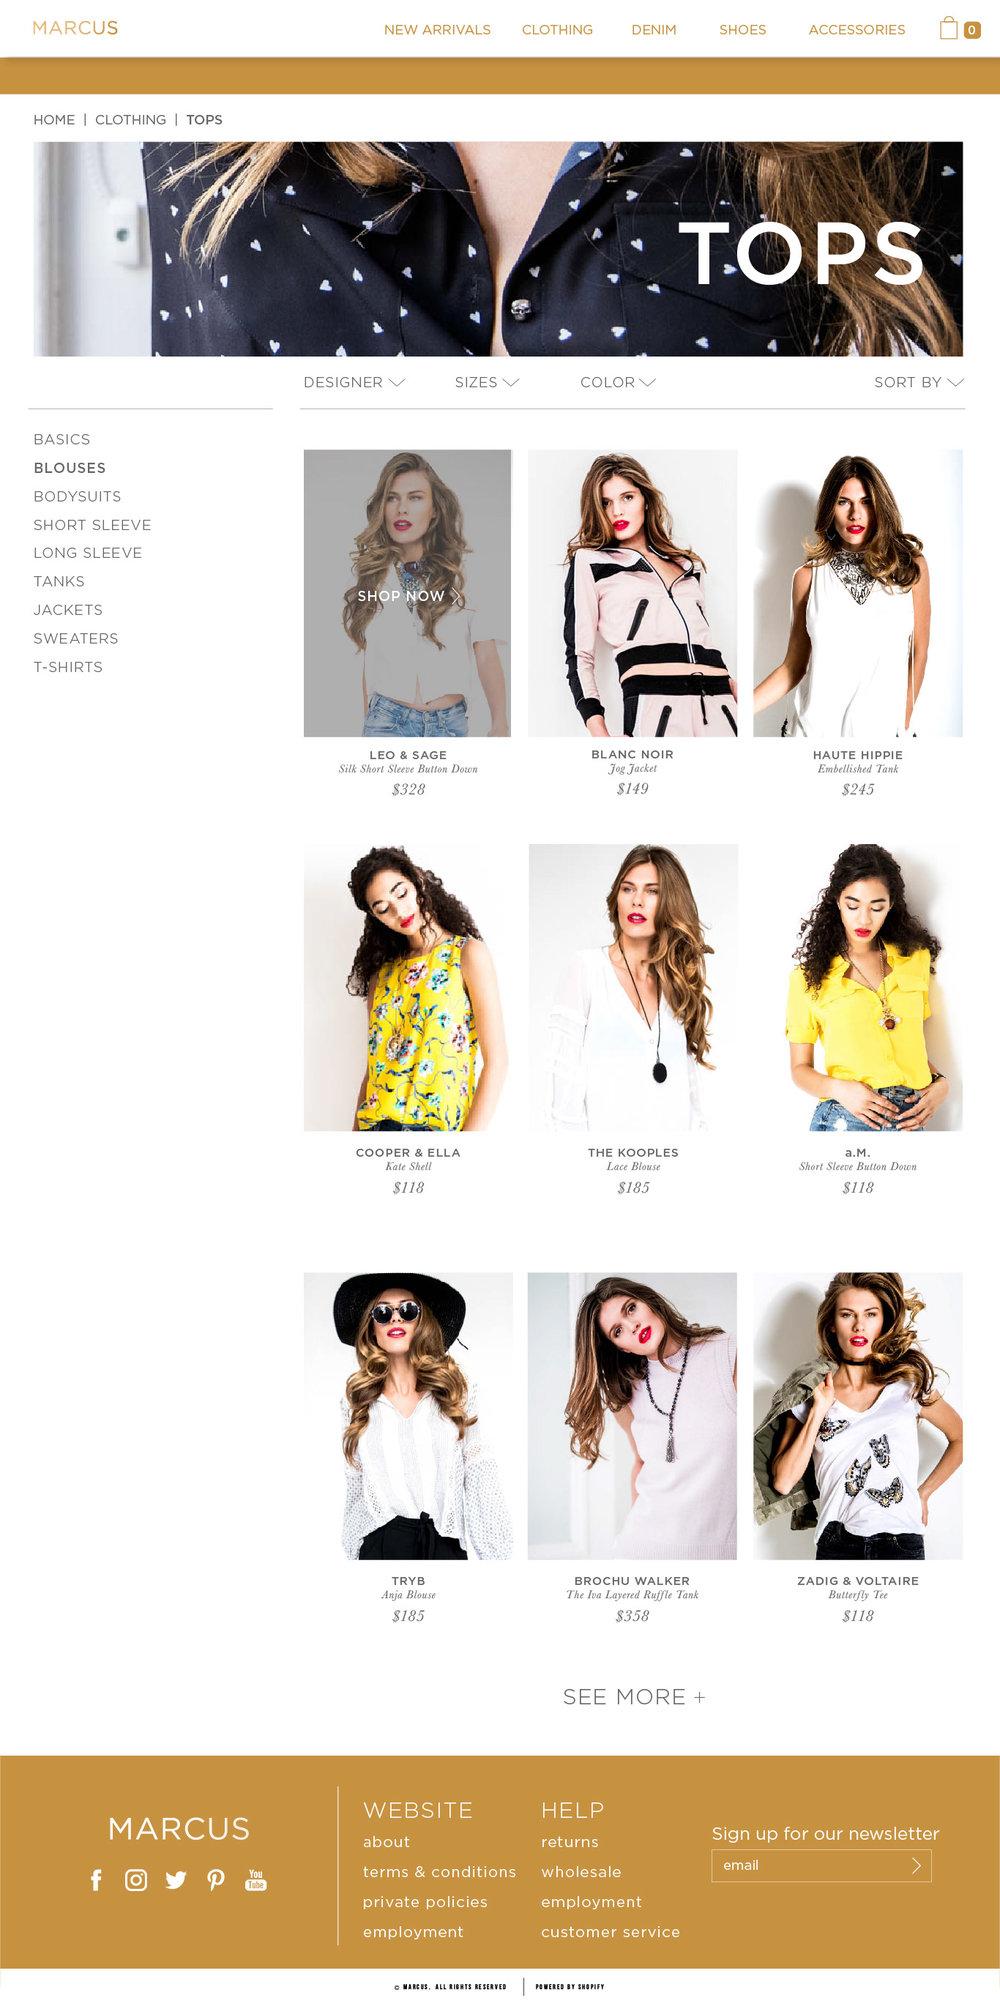 Shop Marcus_Shop_Category_Tops-02.jpg